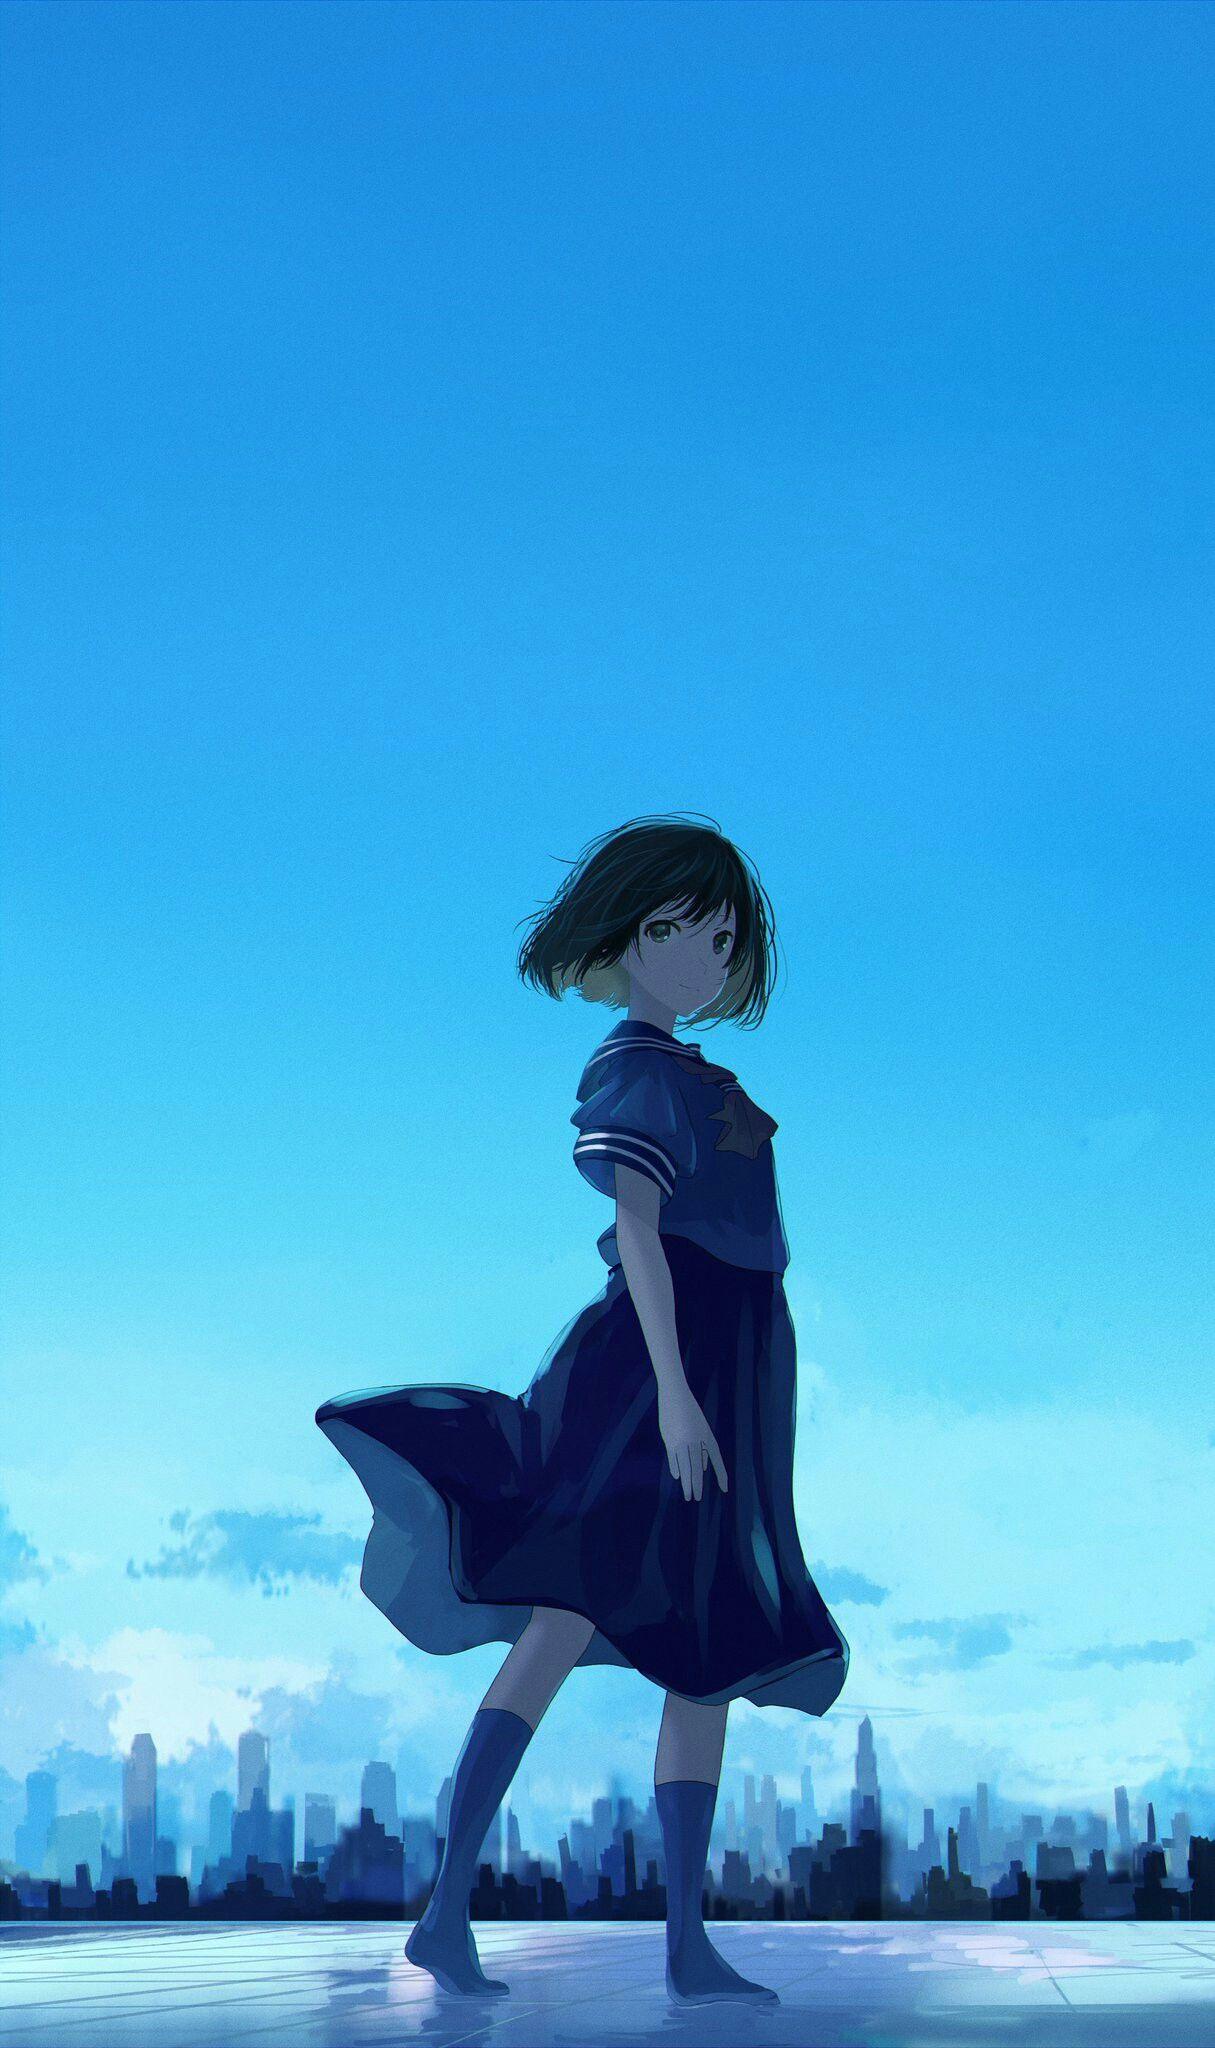 Girls Sky Wallpapers Animegirl Animekawaii Kawaii Sky